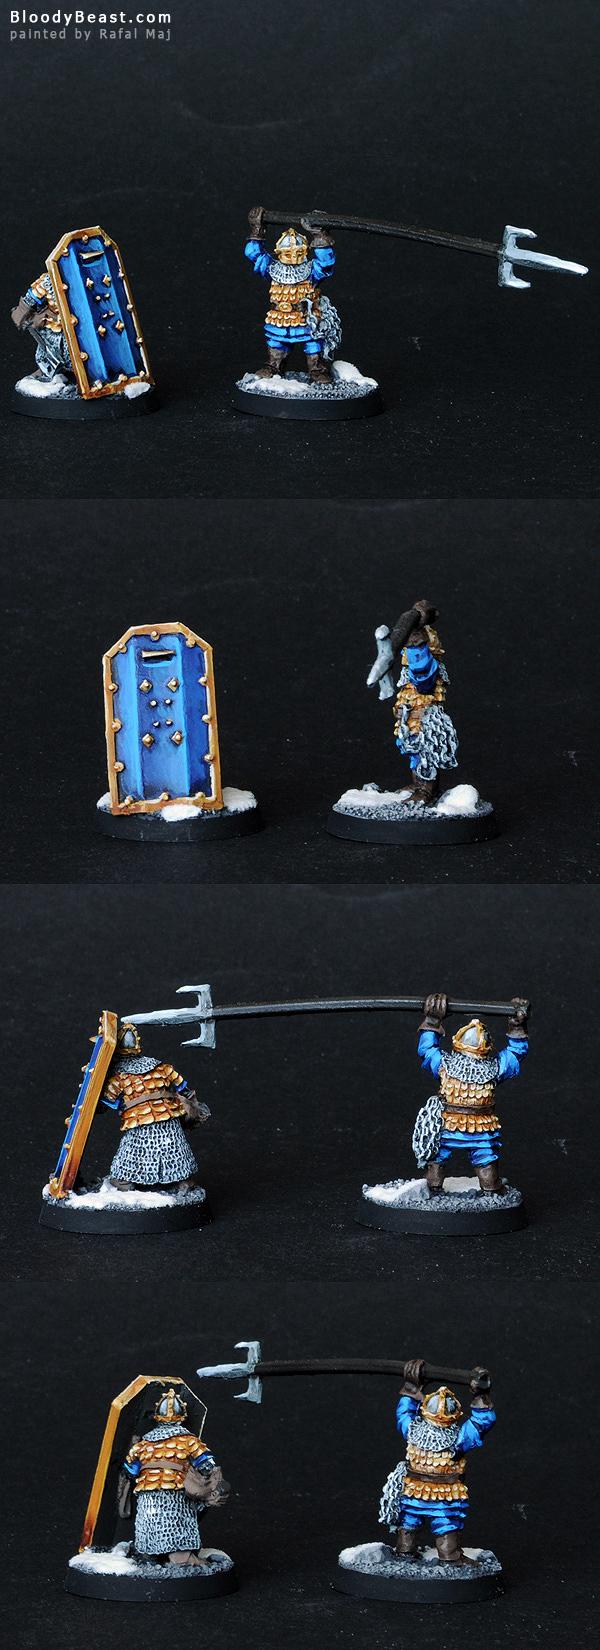 Dwarf Vault Warden Team painted by Rafal Maj (BloodyBeast.com)